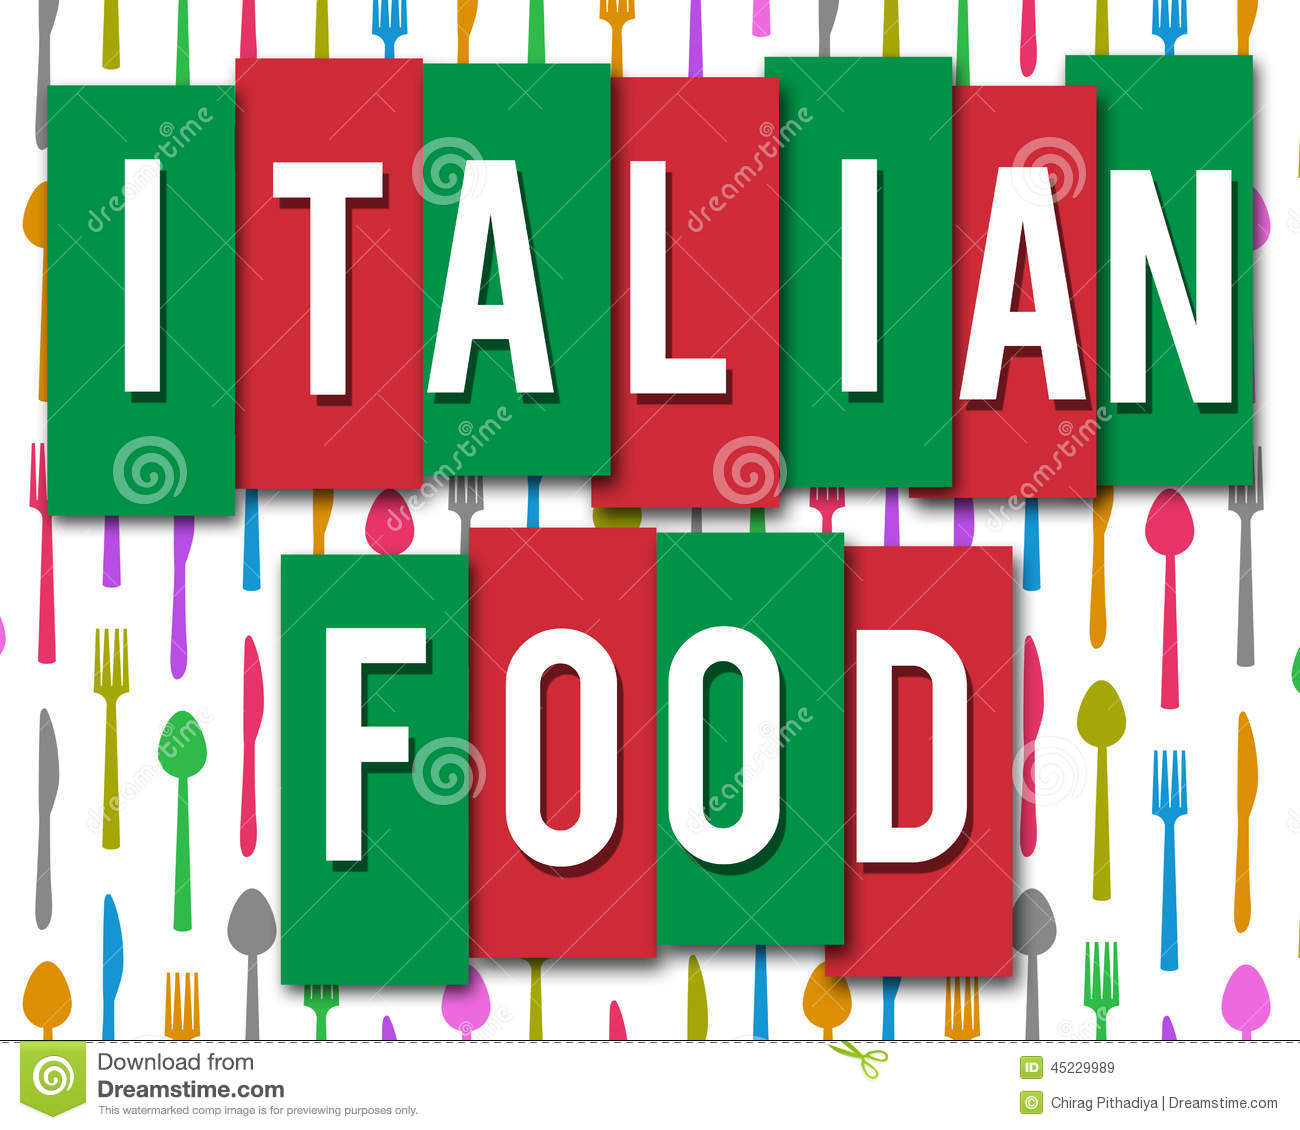 Italian Food - Italian Food Clip Art